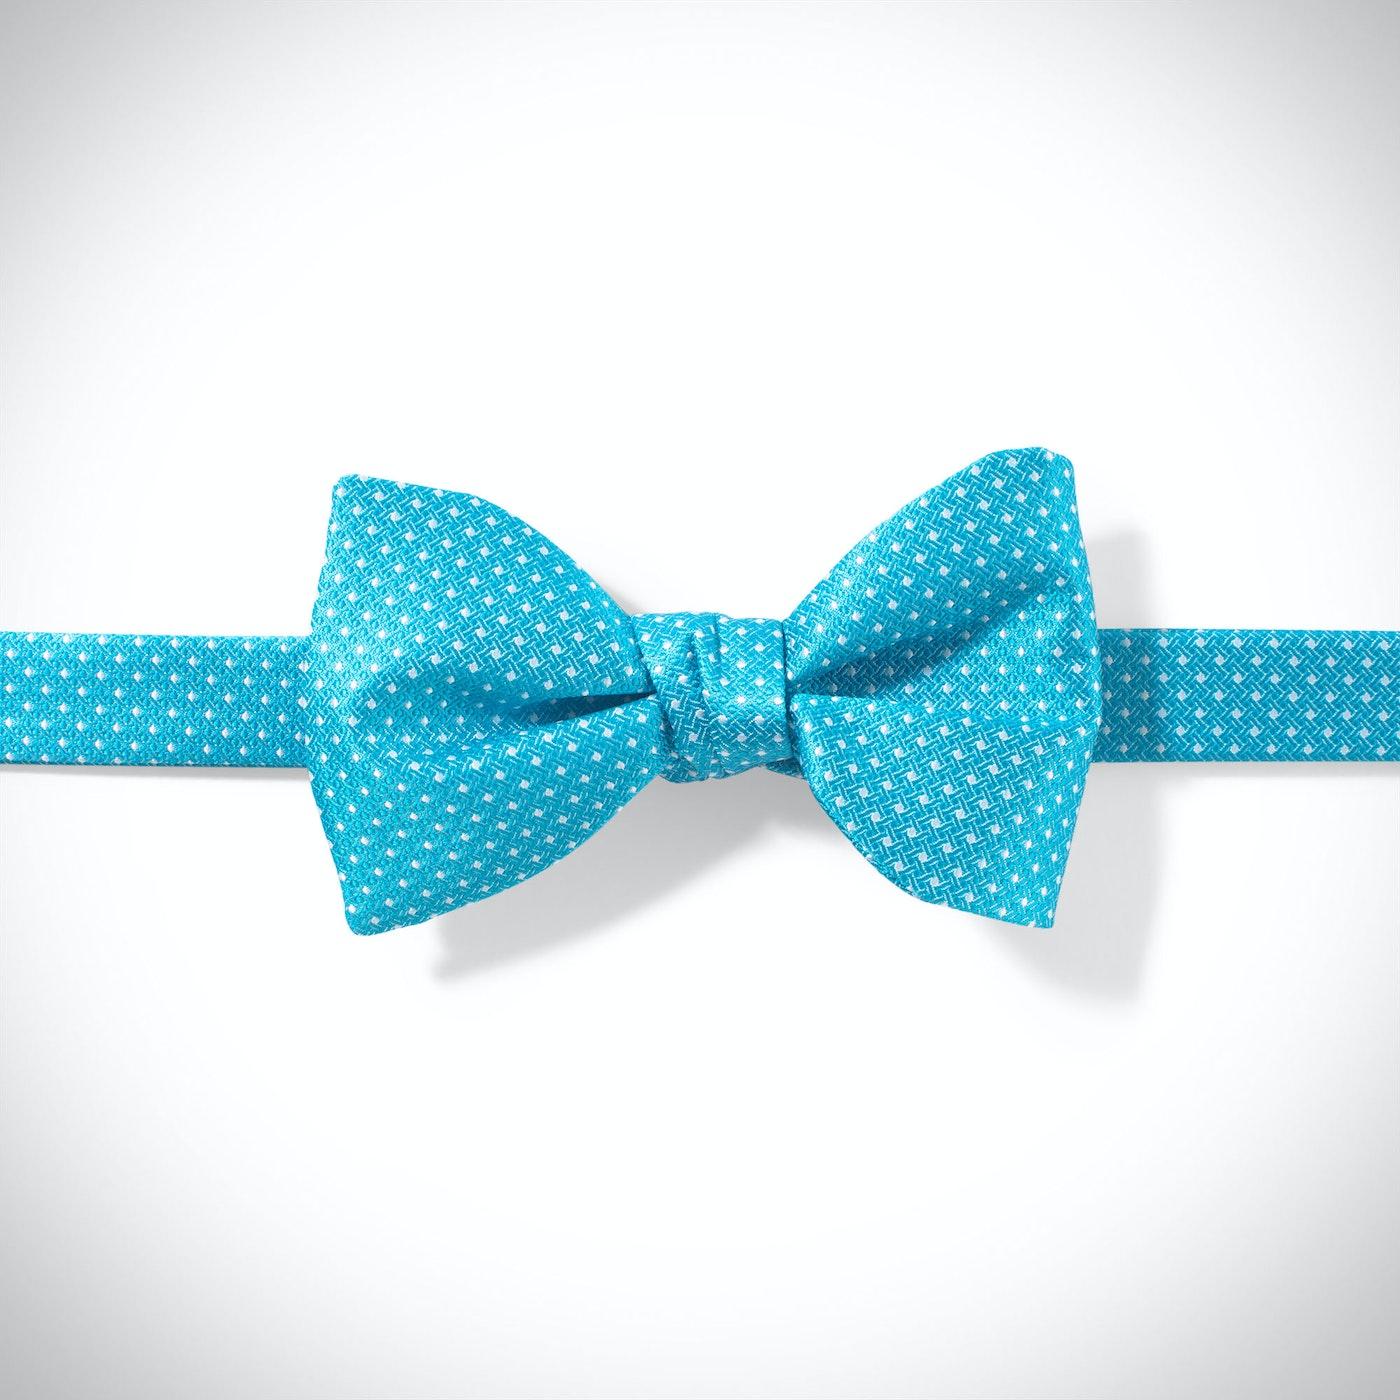 Aqua and White Pin Dot Pre-Tied Bow Tie